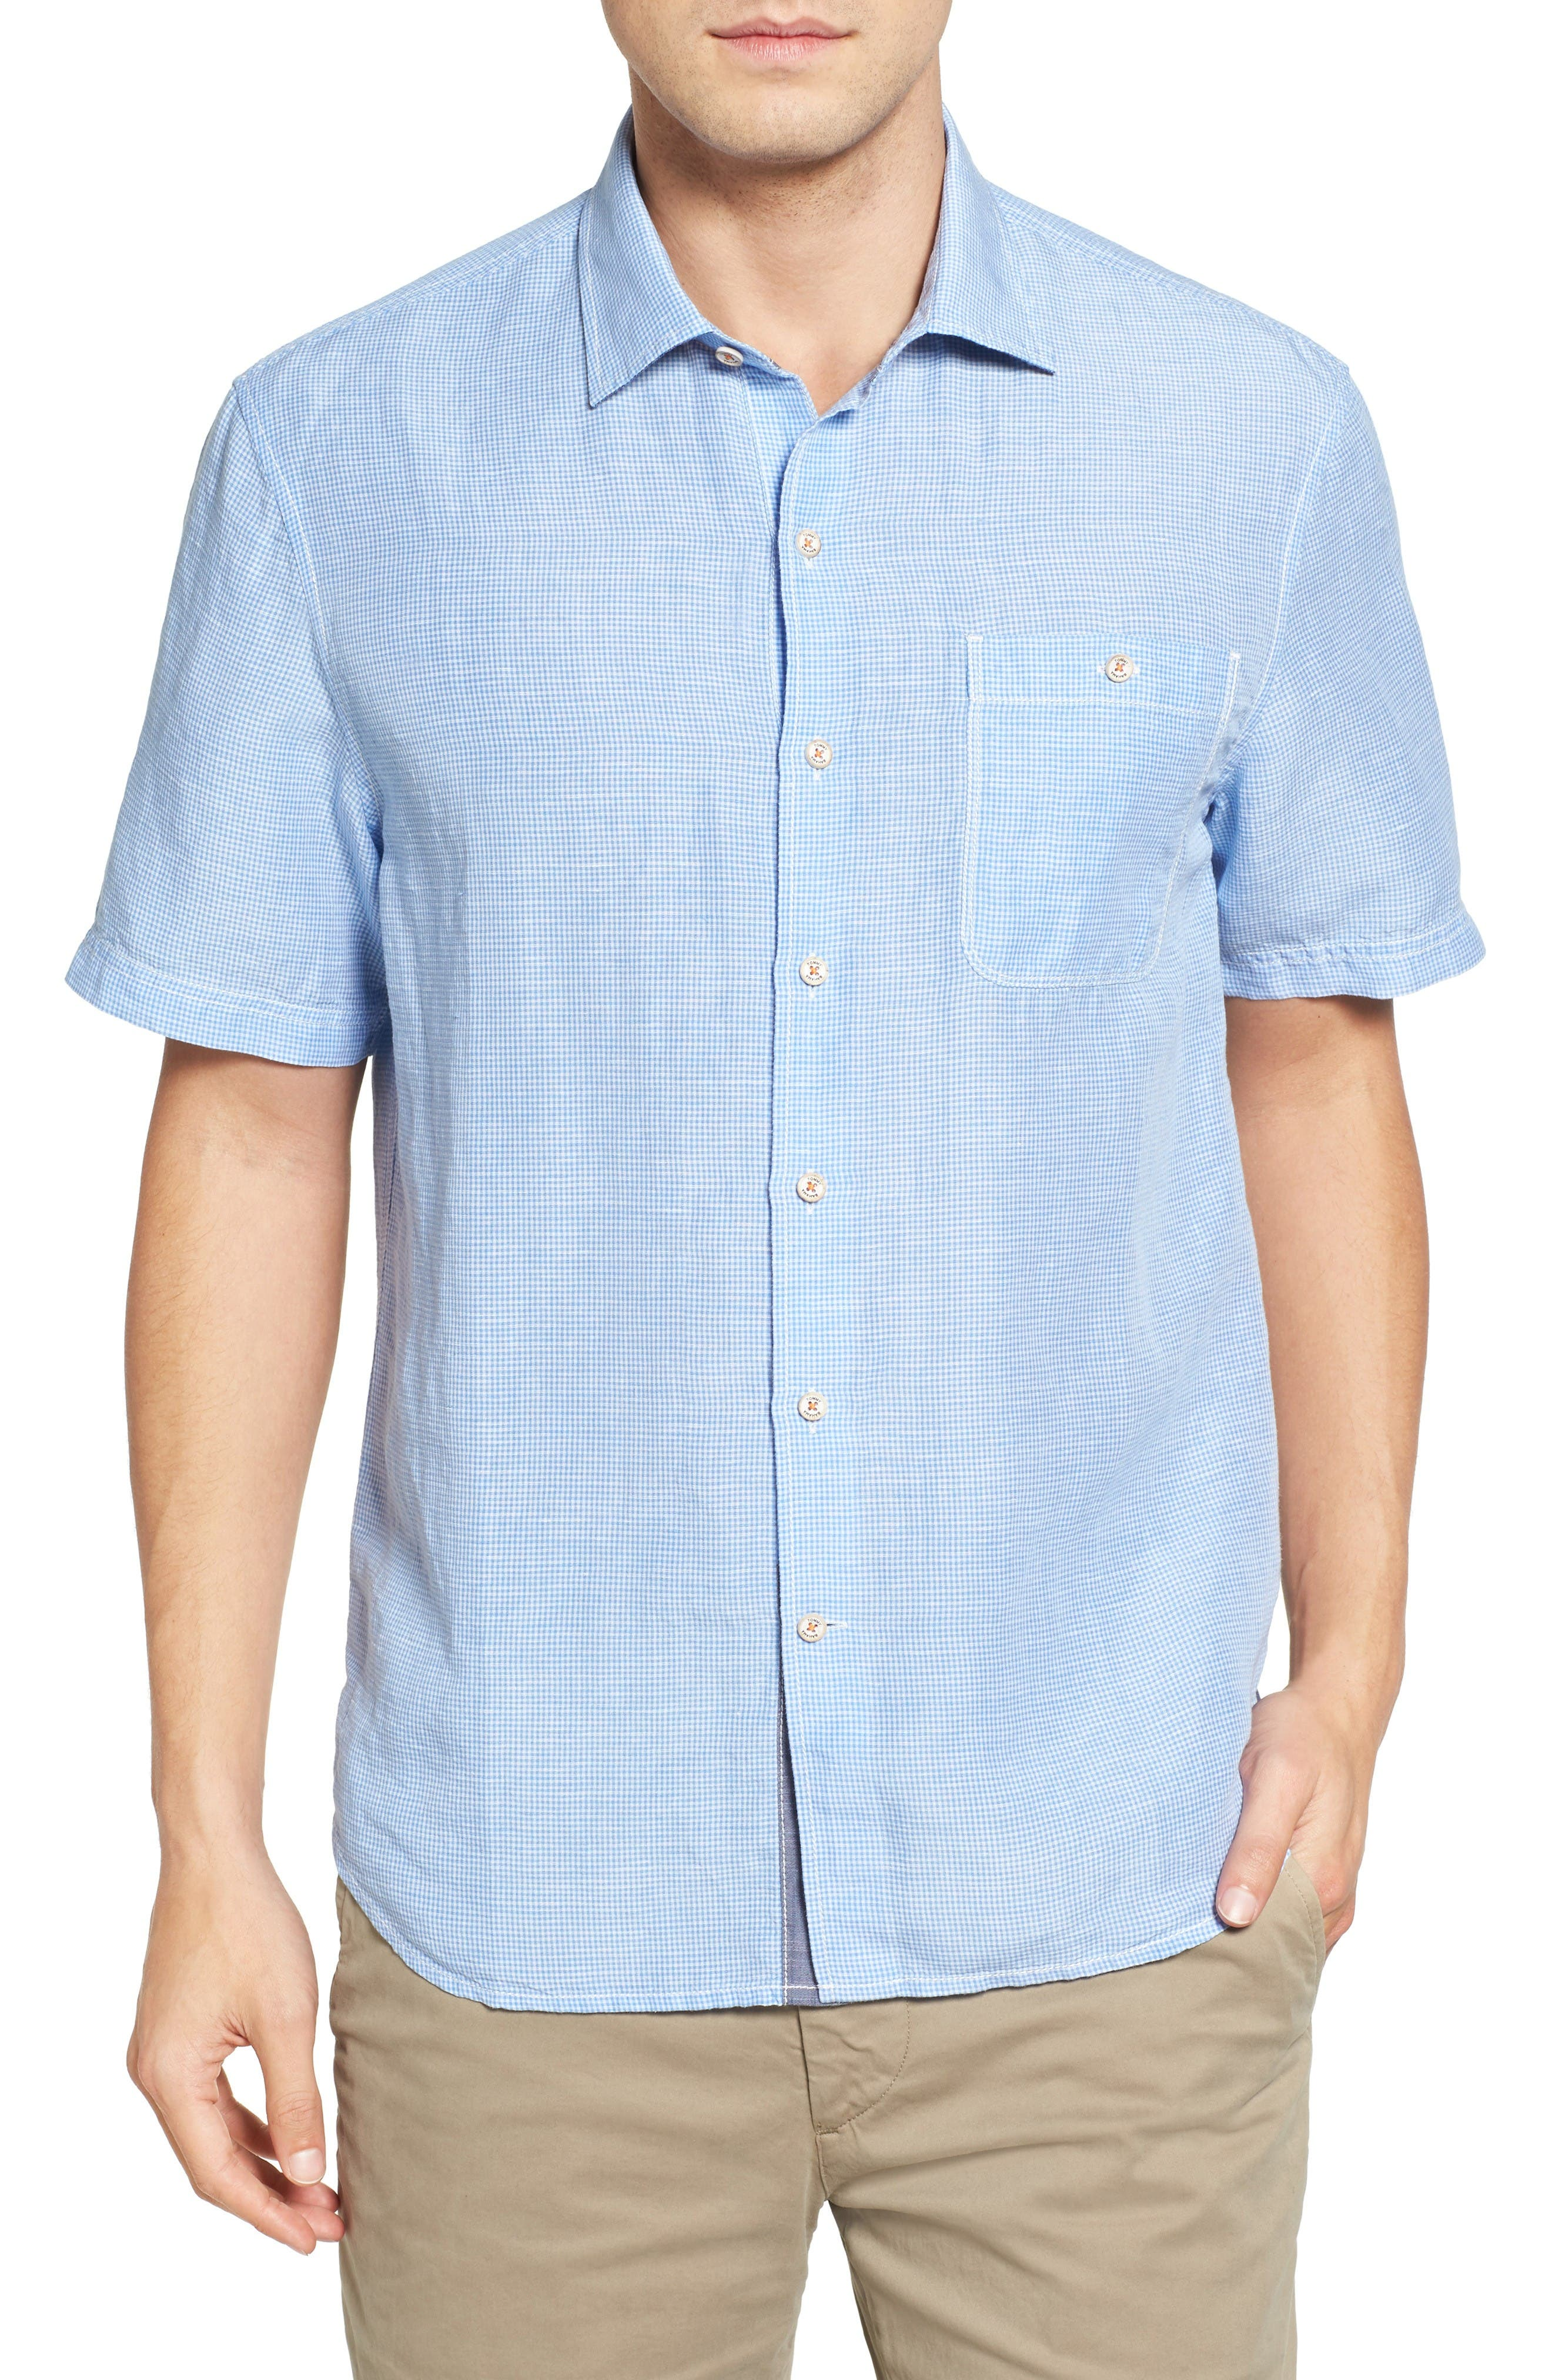 Main Image - Tommy Bahama Sand Linen Check Sport Shirt